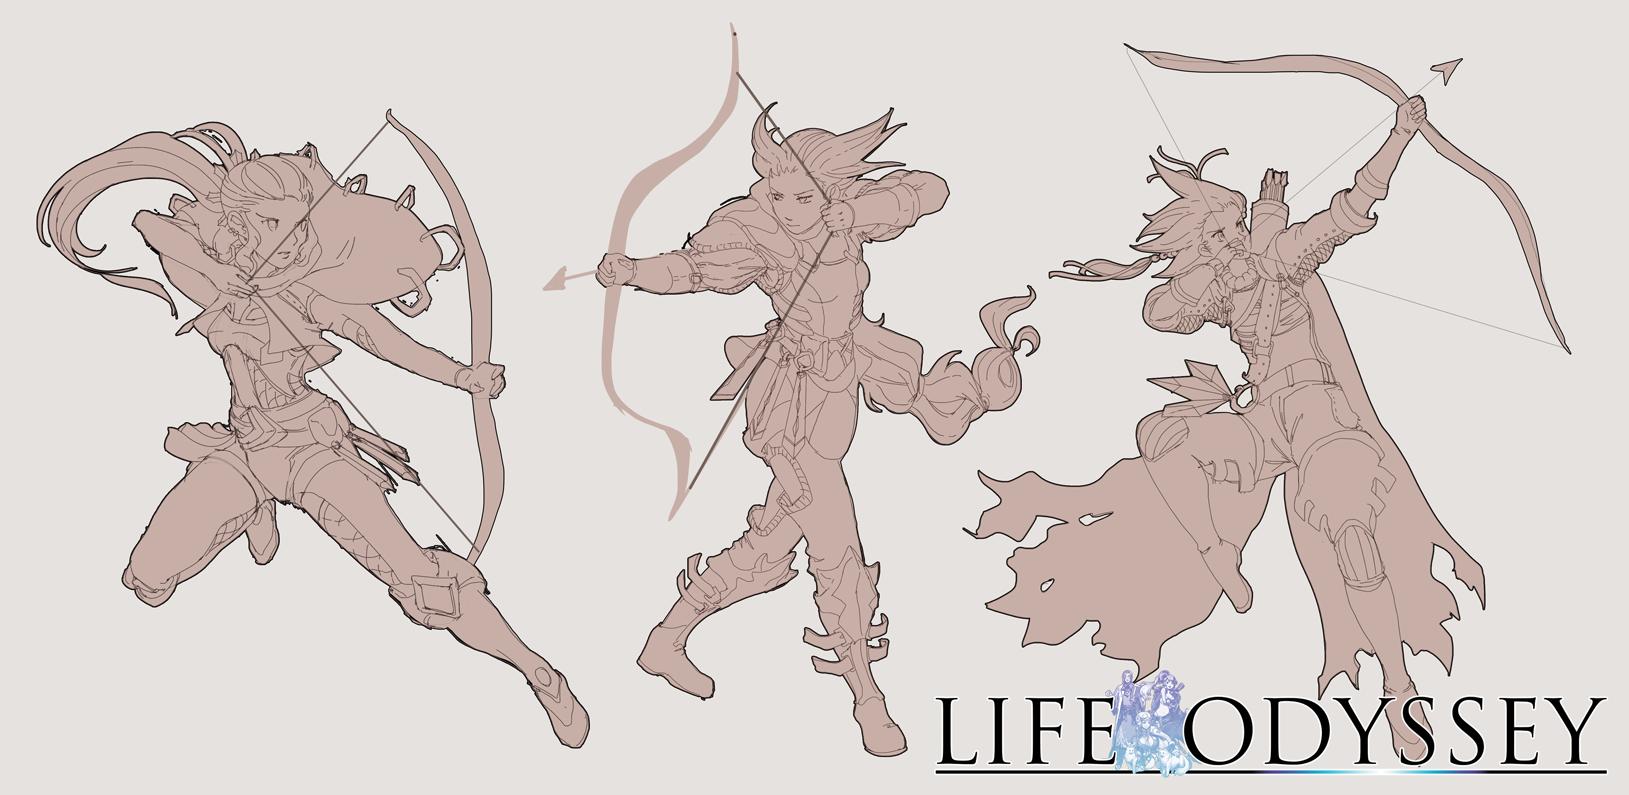 Female Archer - Character Design (Exploration Sketches)